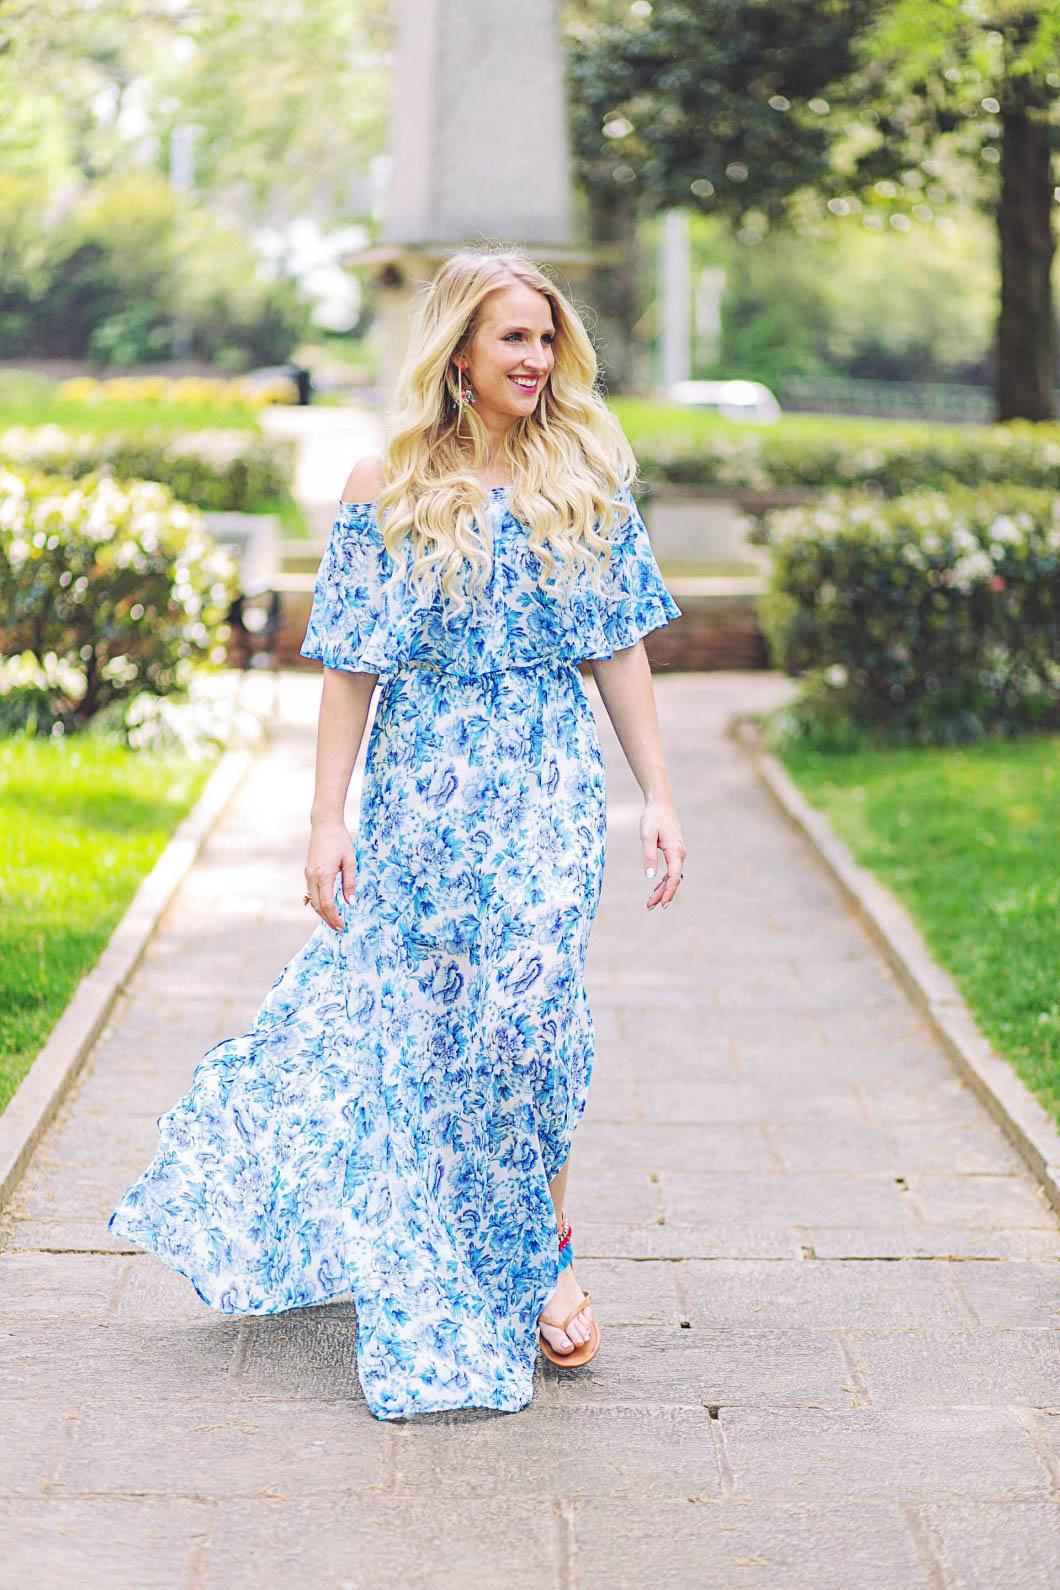 zappos and show me your mumu dress